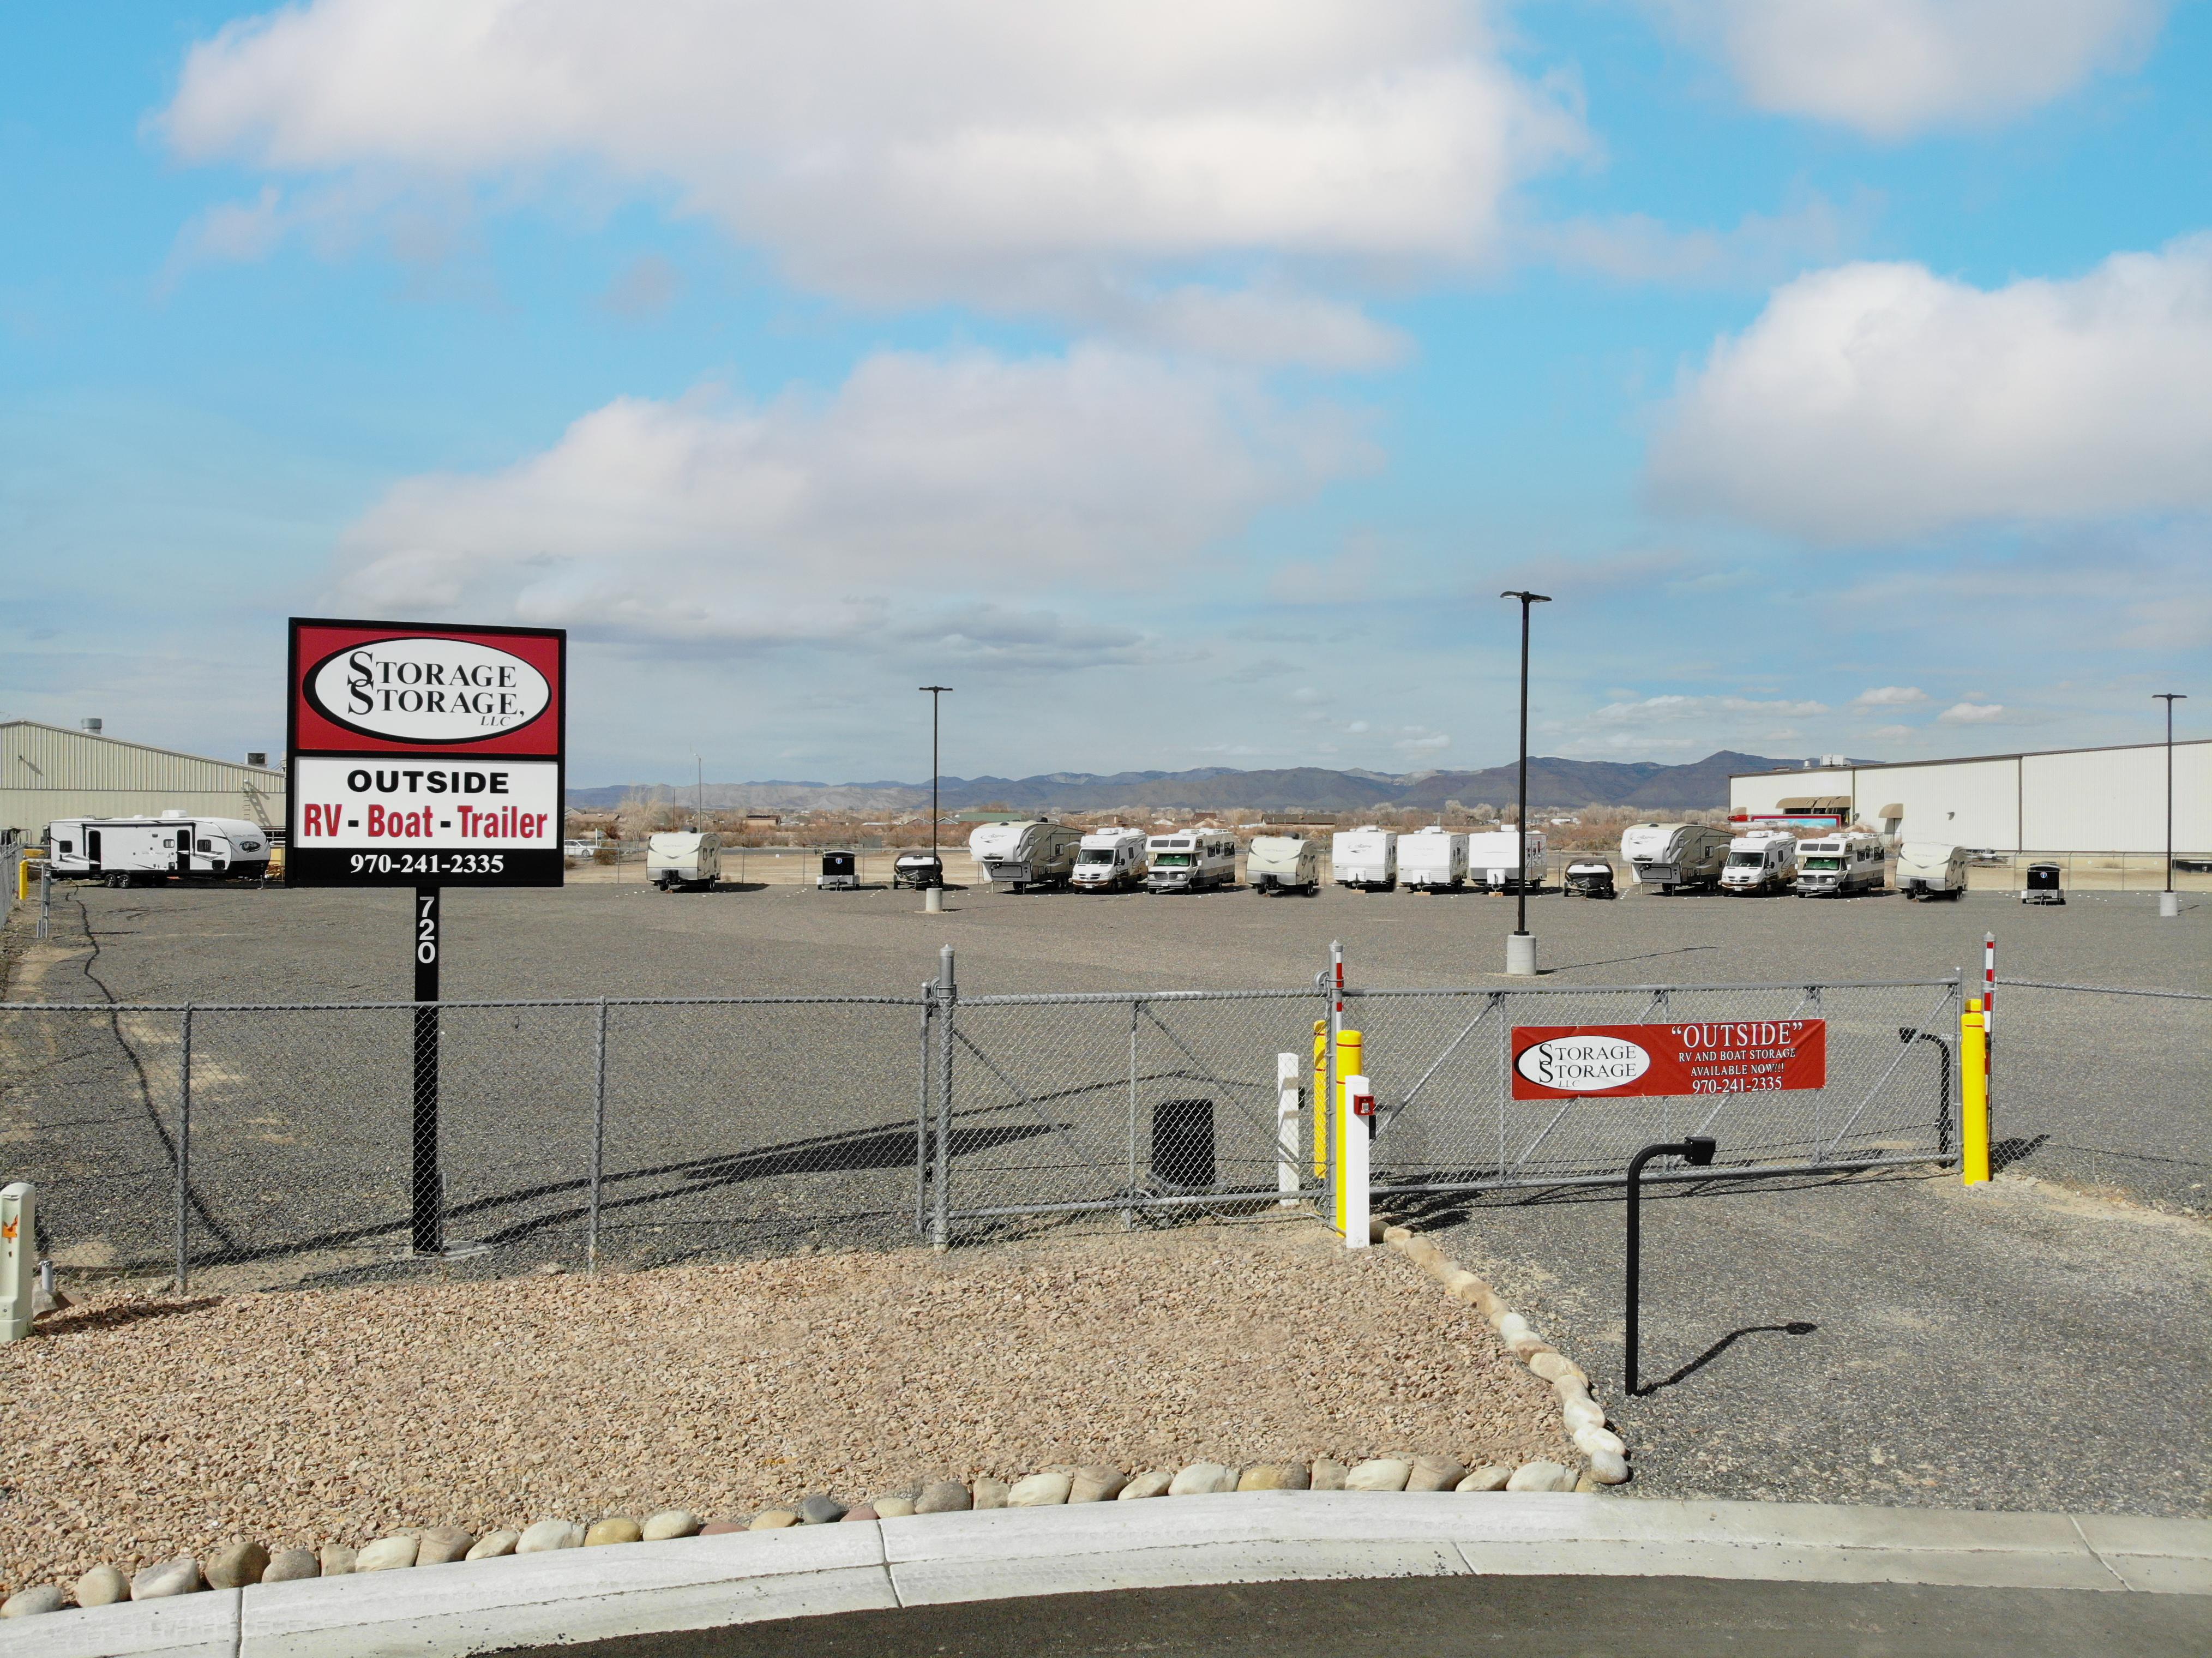 Arrowest in Grand Junction, CO